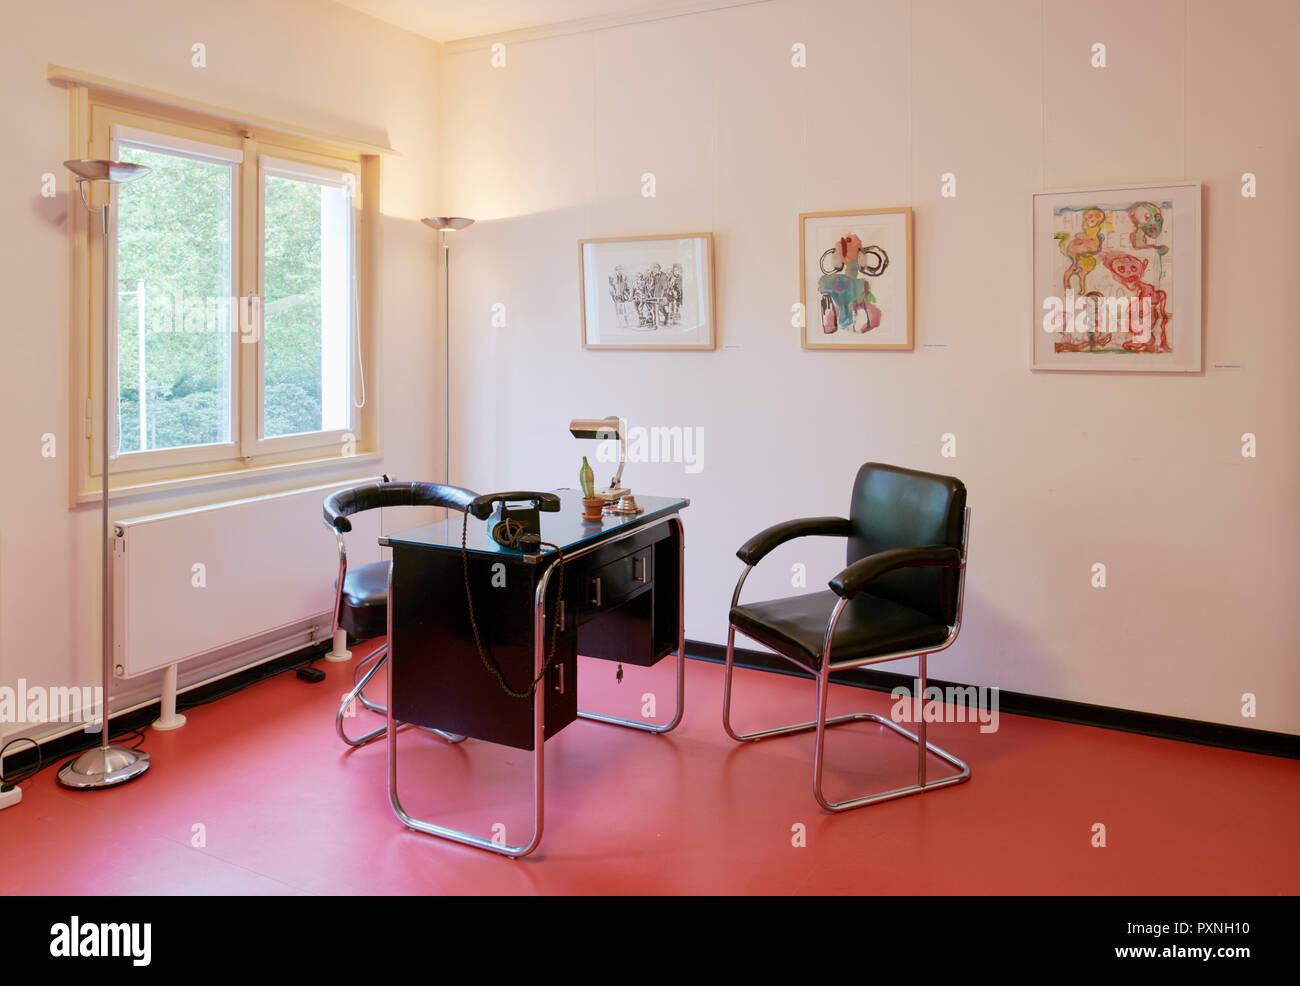 Wolf Haus Reggio Emilia jander stock photos & jander stock images - alamy